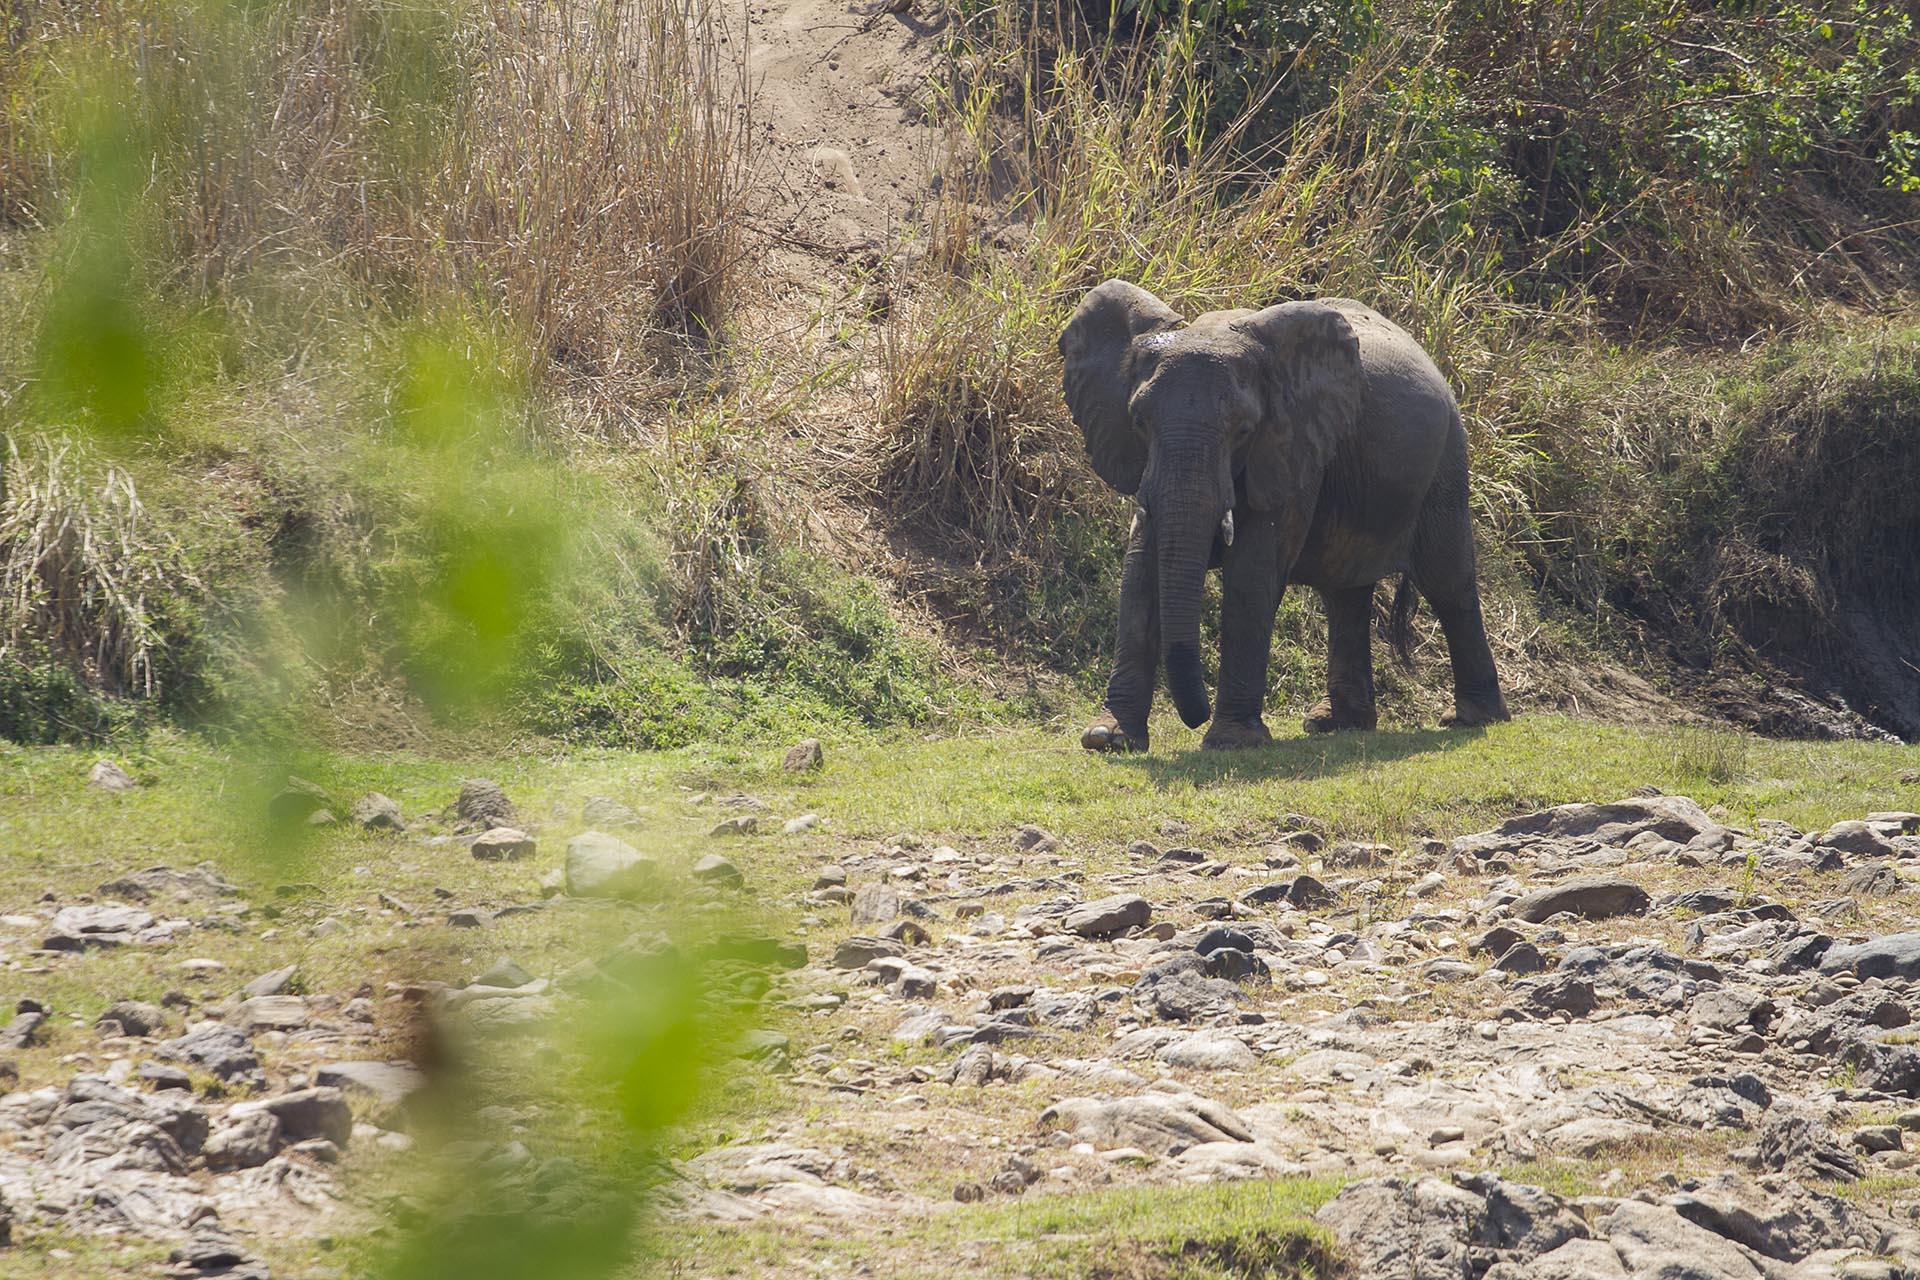 malawi national parks nkhotakota-wildlife-reserve-reserves-malawian-style-malawi-adventures-experiences-specialist-tour-operator-elephant-malawi-safari